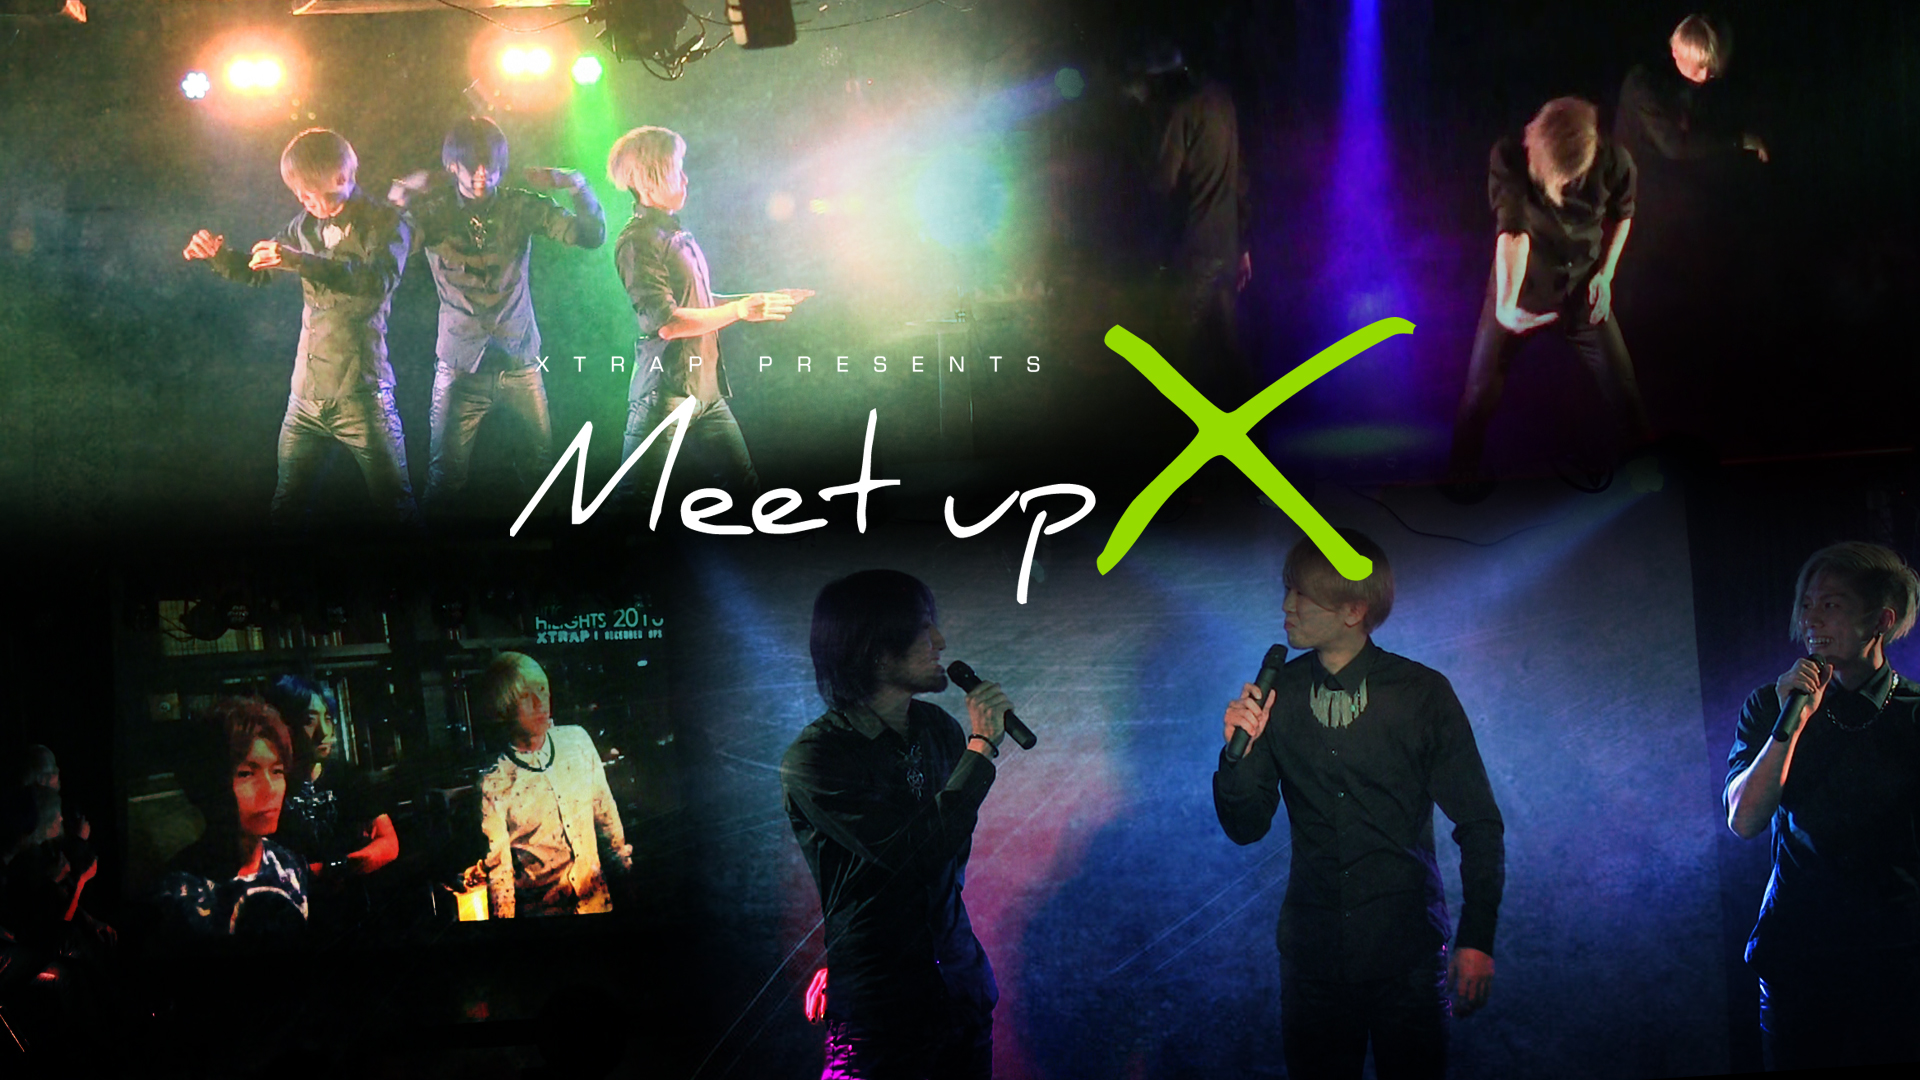 2017/2/1 XTRAP presents 「Meet up X」ニューイヤーライブ(終了)